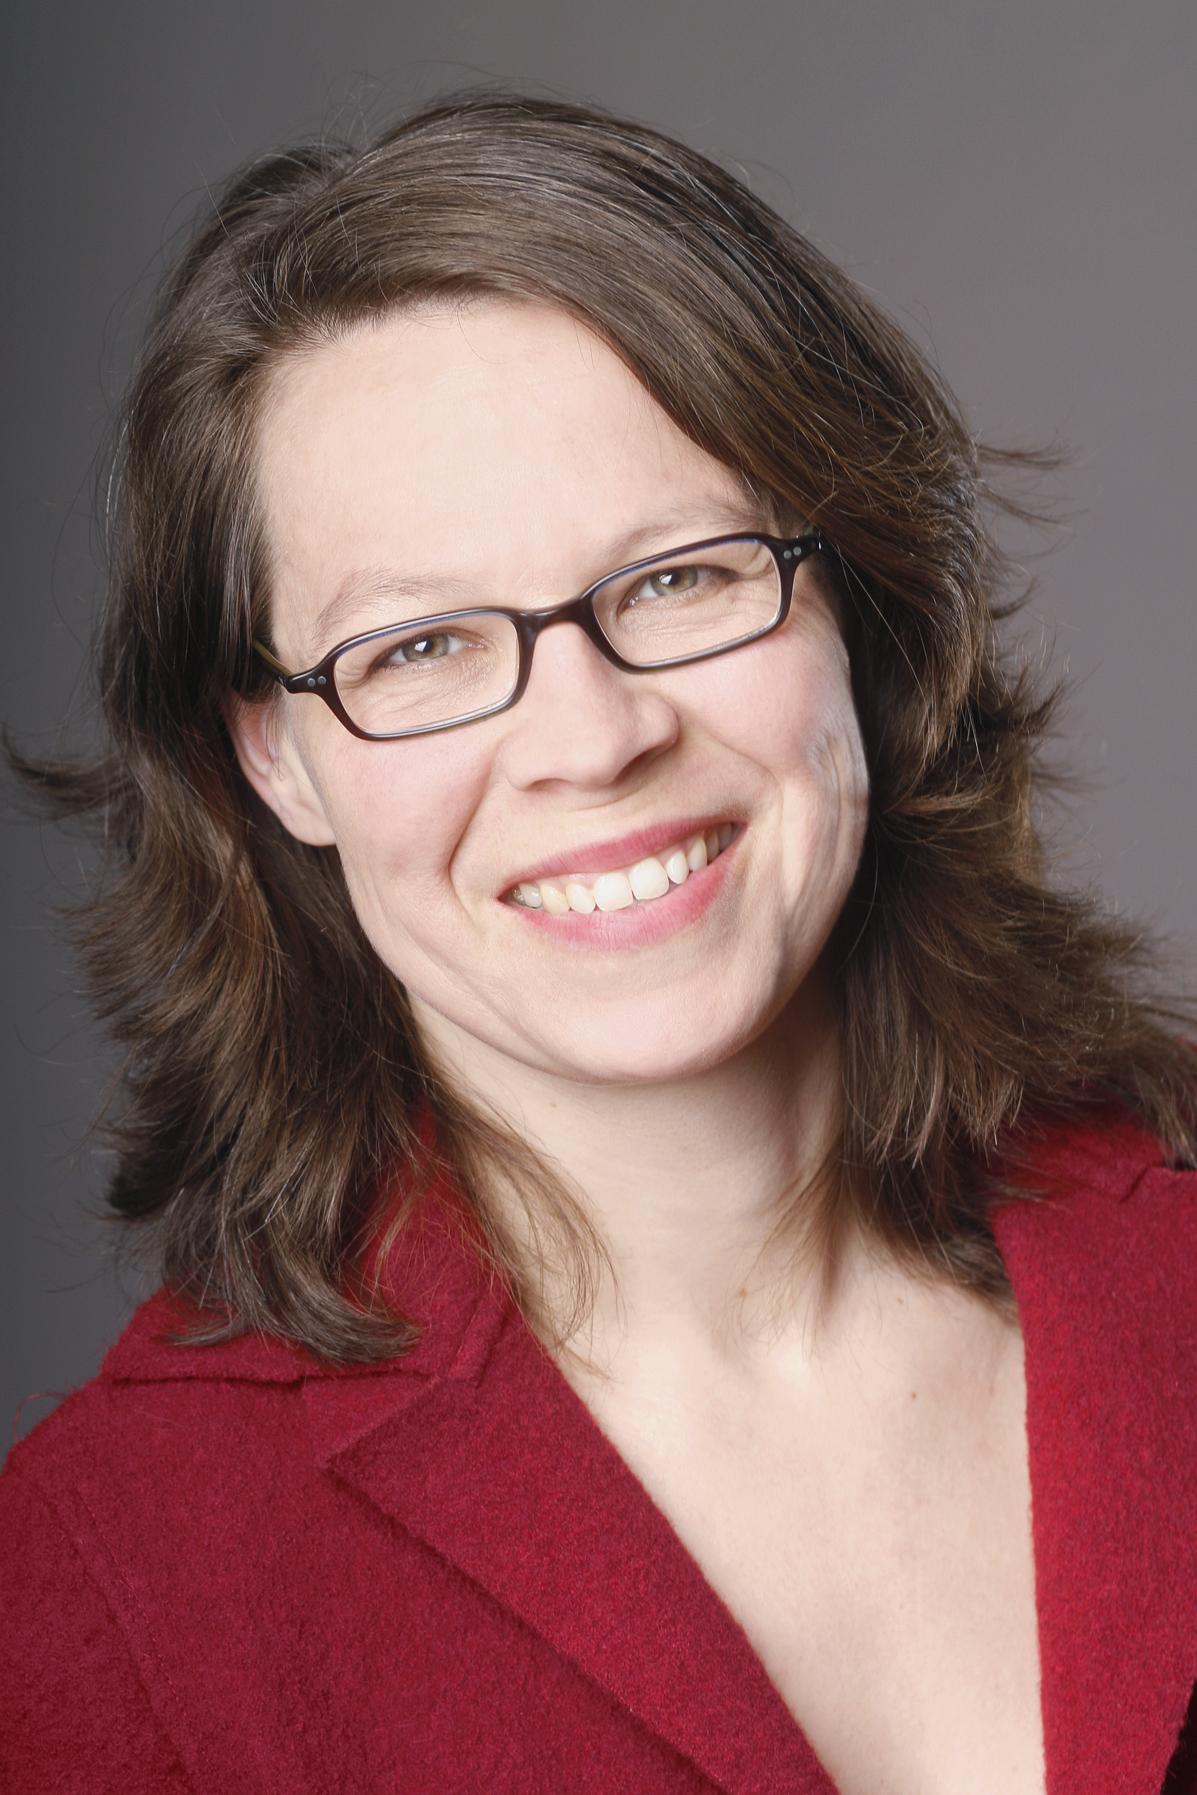 Carola_Kleinschmidt_Arbeitsphilosophen